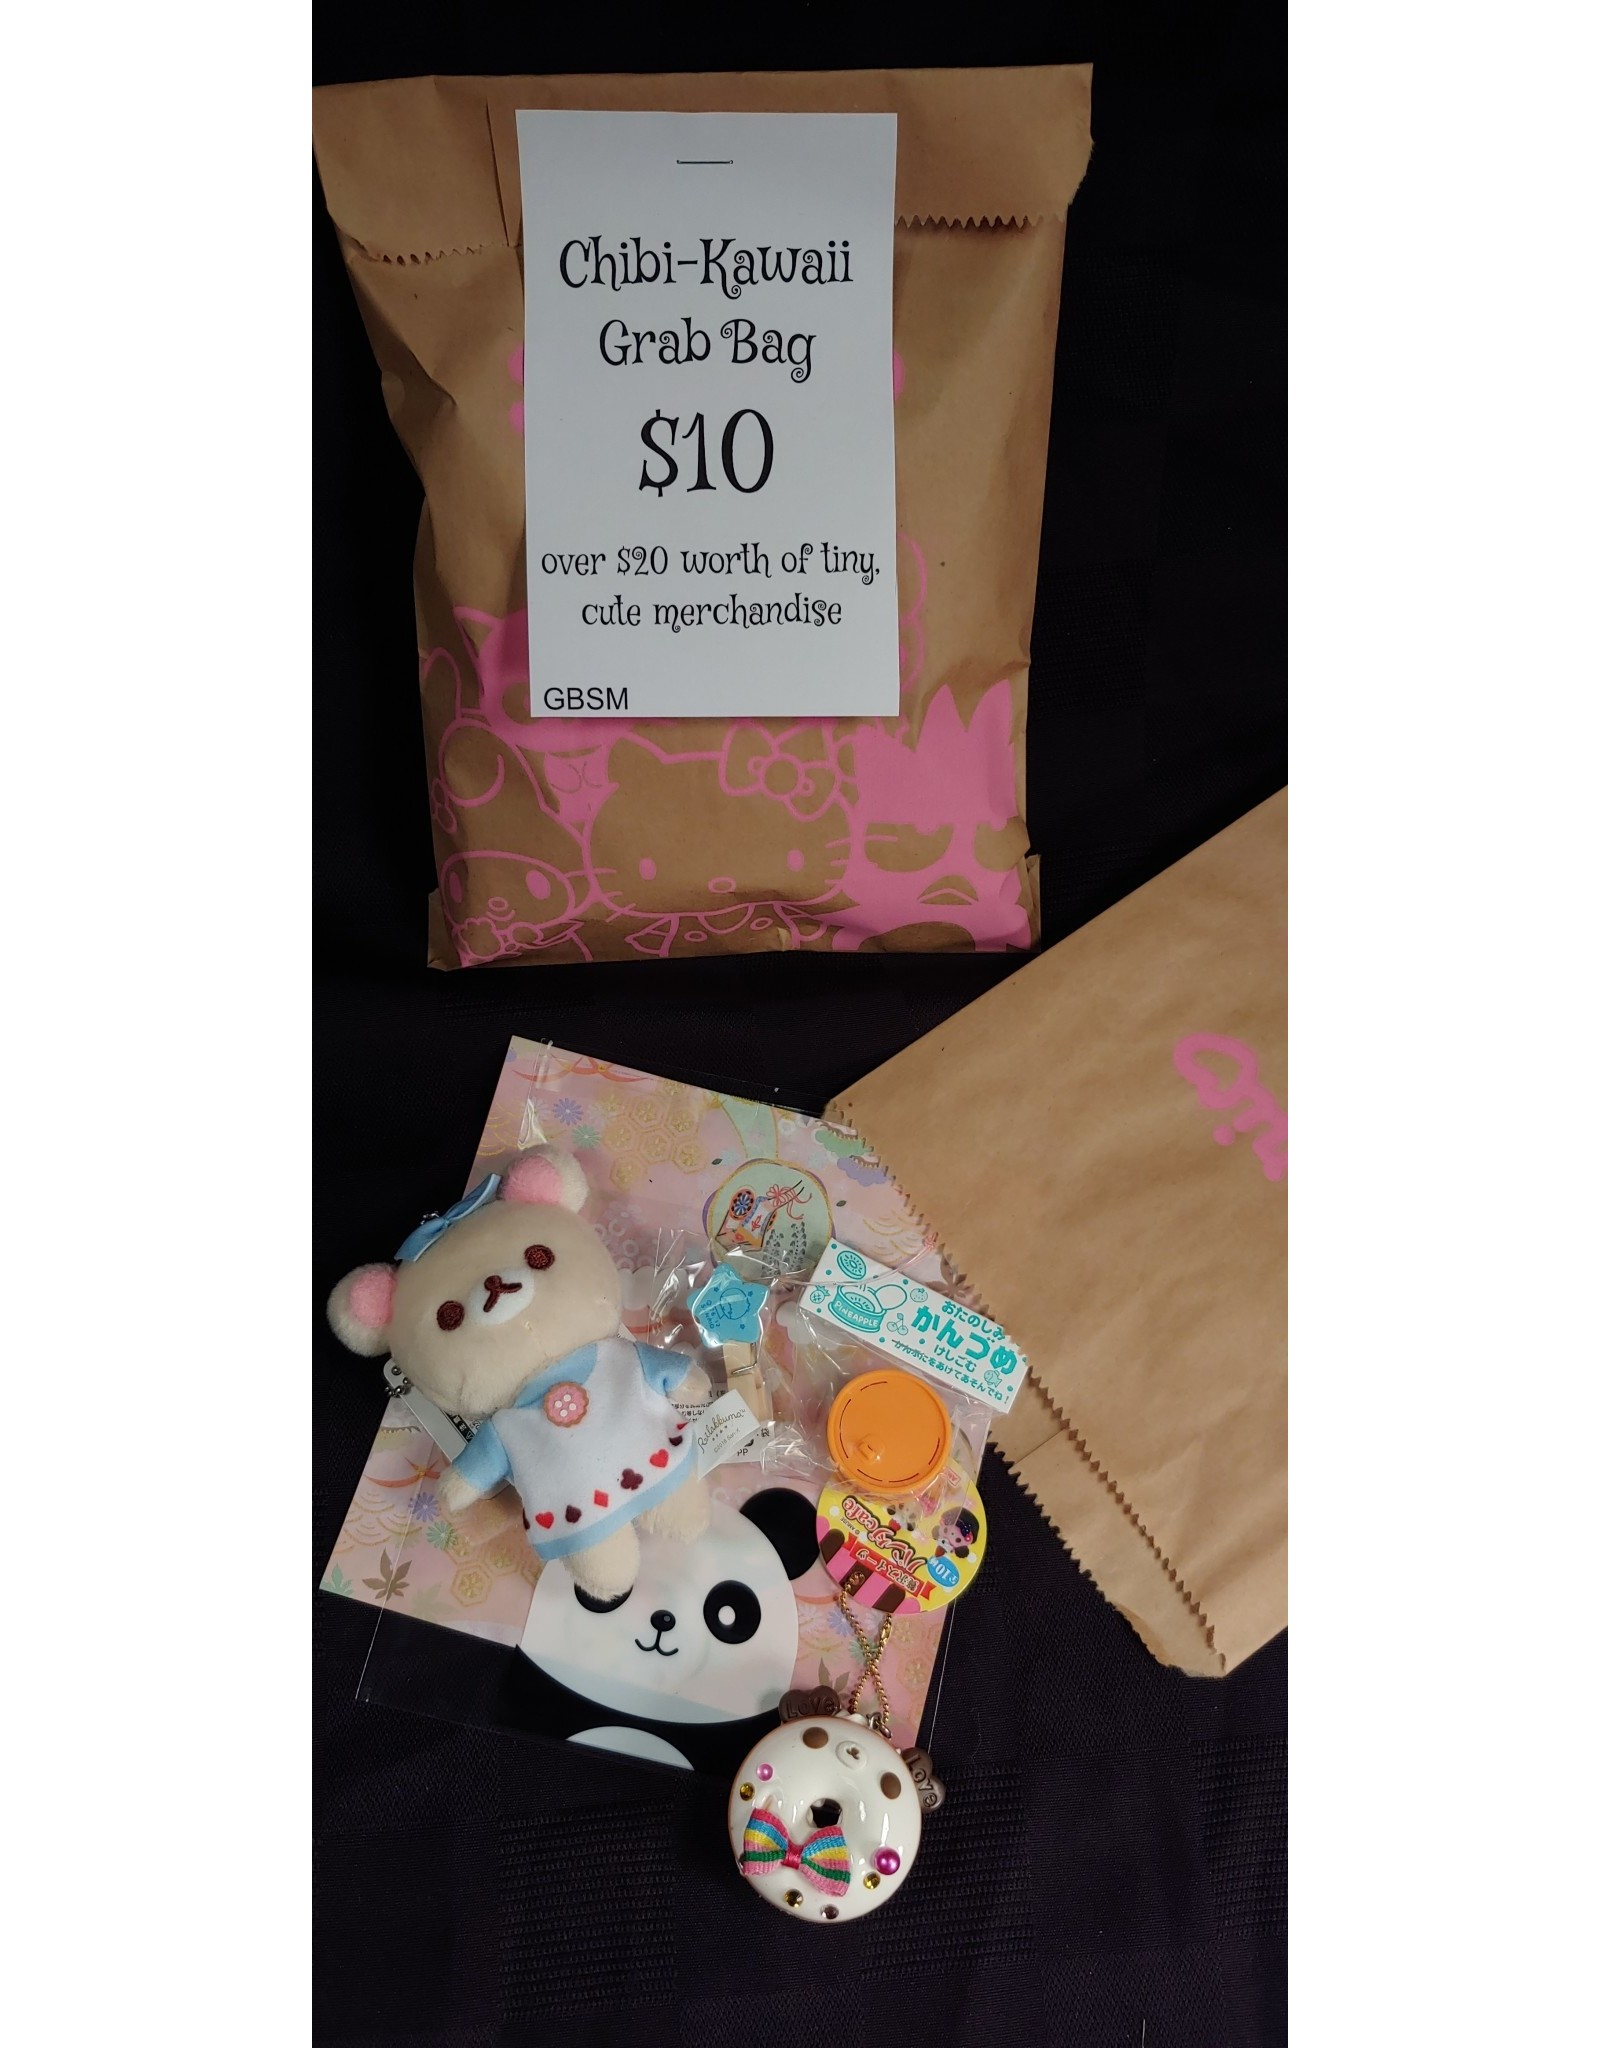 Chibi Kawaii (small cute)  Grab Bag